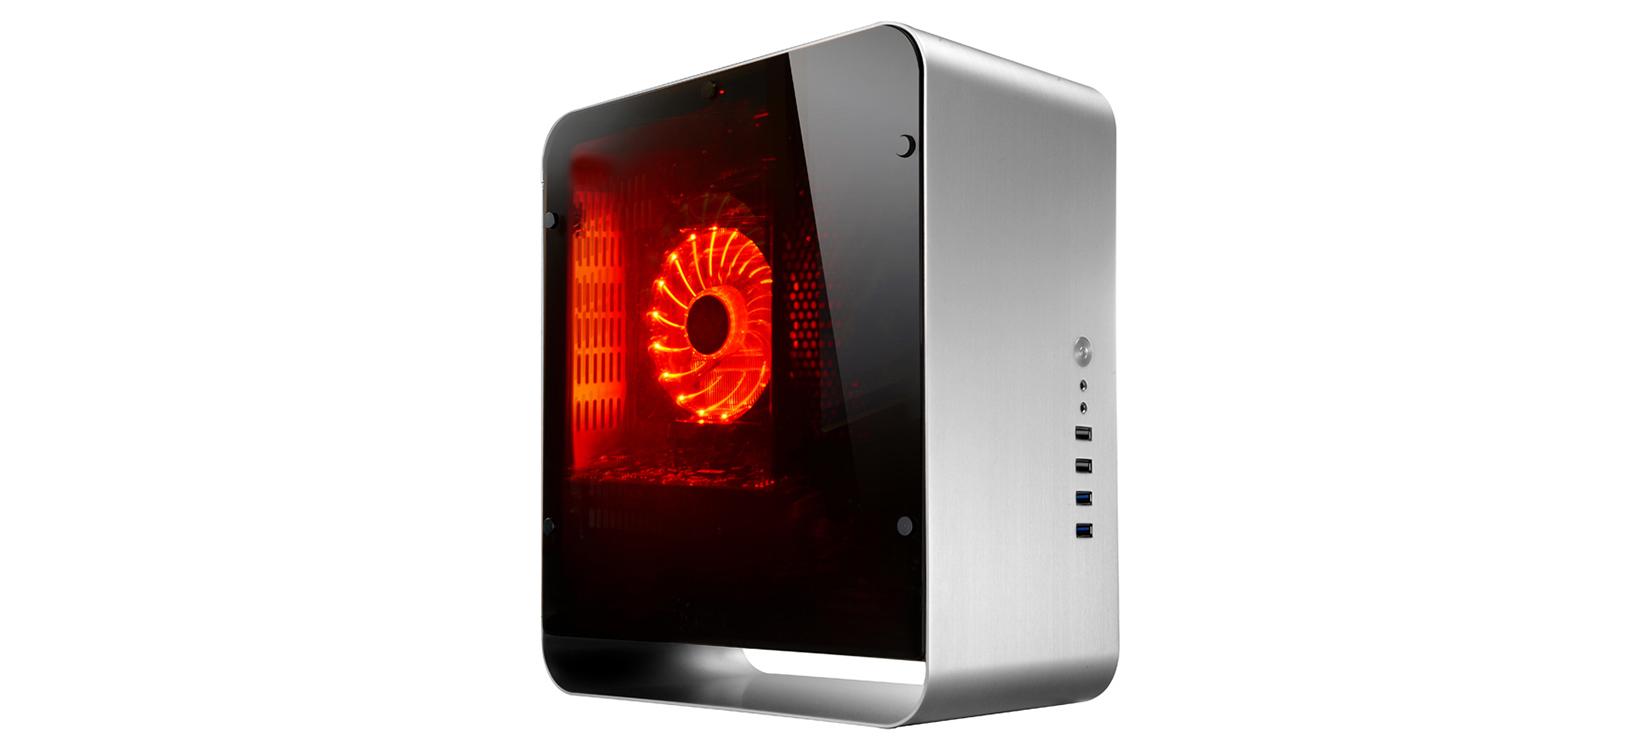 Jonsbo UMX1-PLUS Tempered Glass (Mini Tower/Màu Bạc) giới thiệu